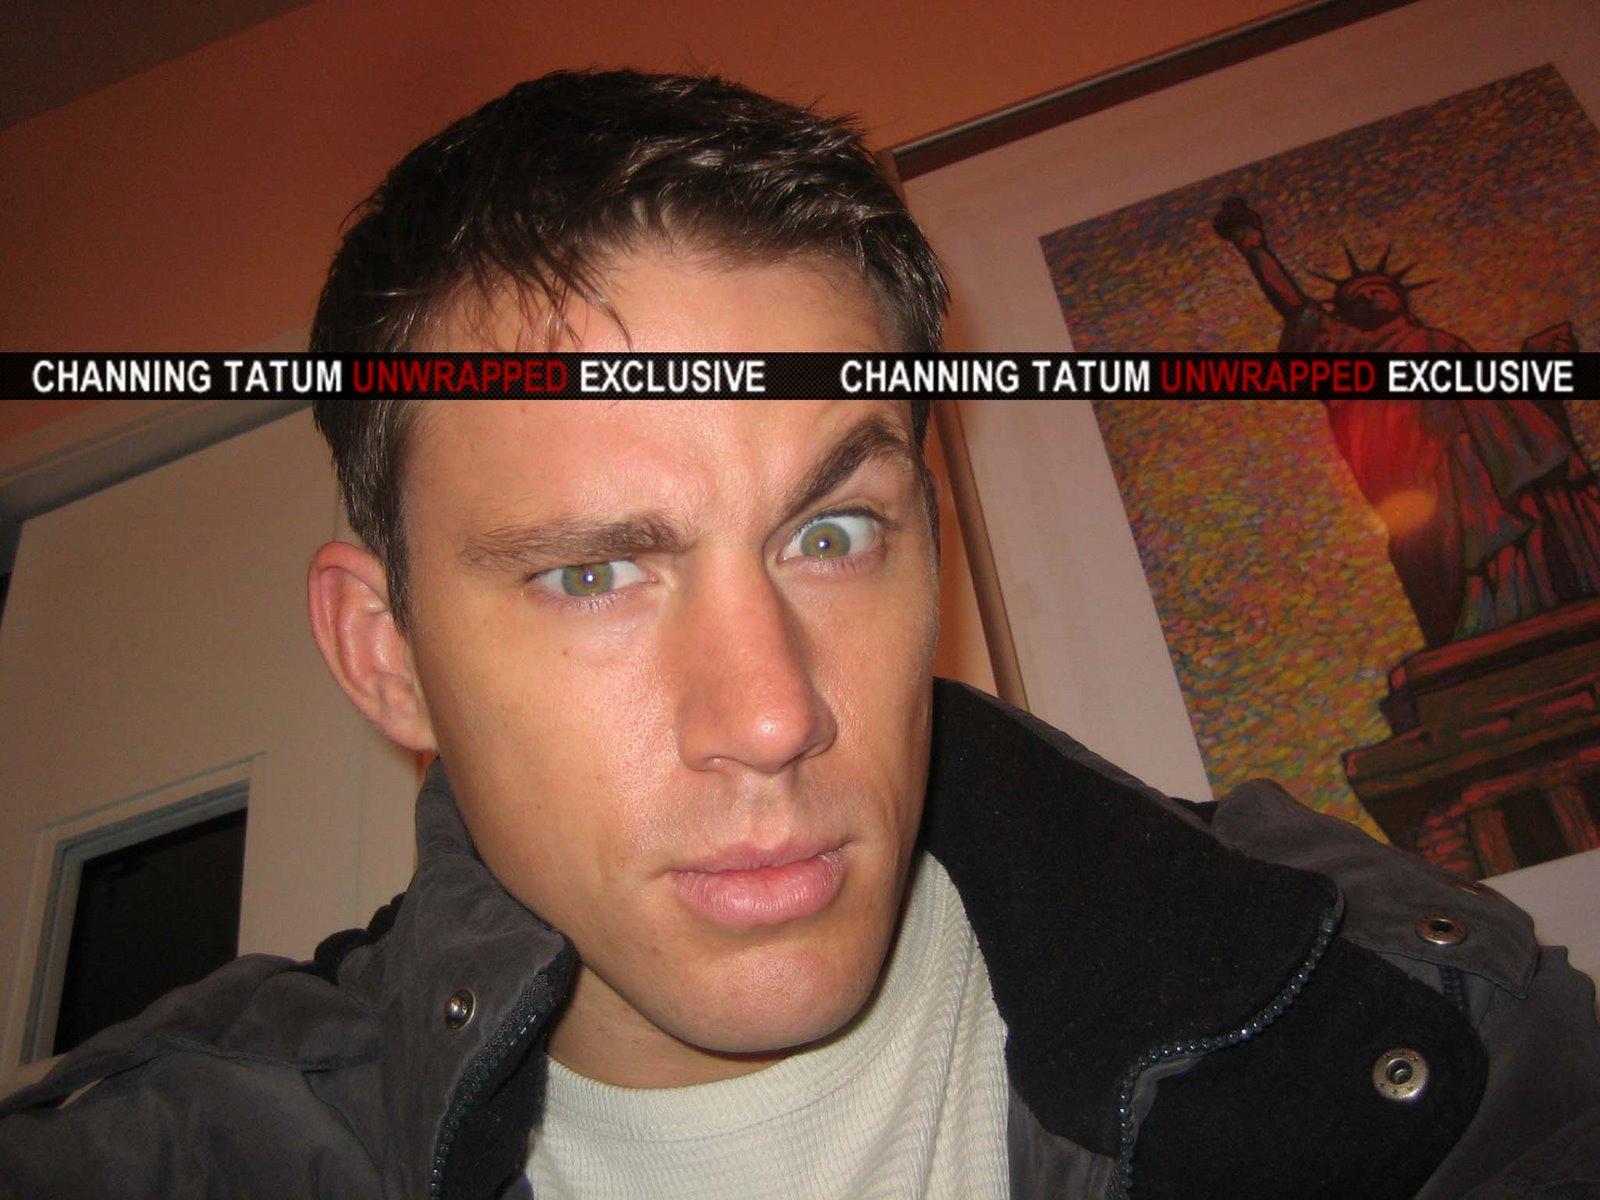 [Channing-Tatum-Unwrapped-NY-Fighting-Set-October-15-2007.jpg]